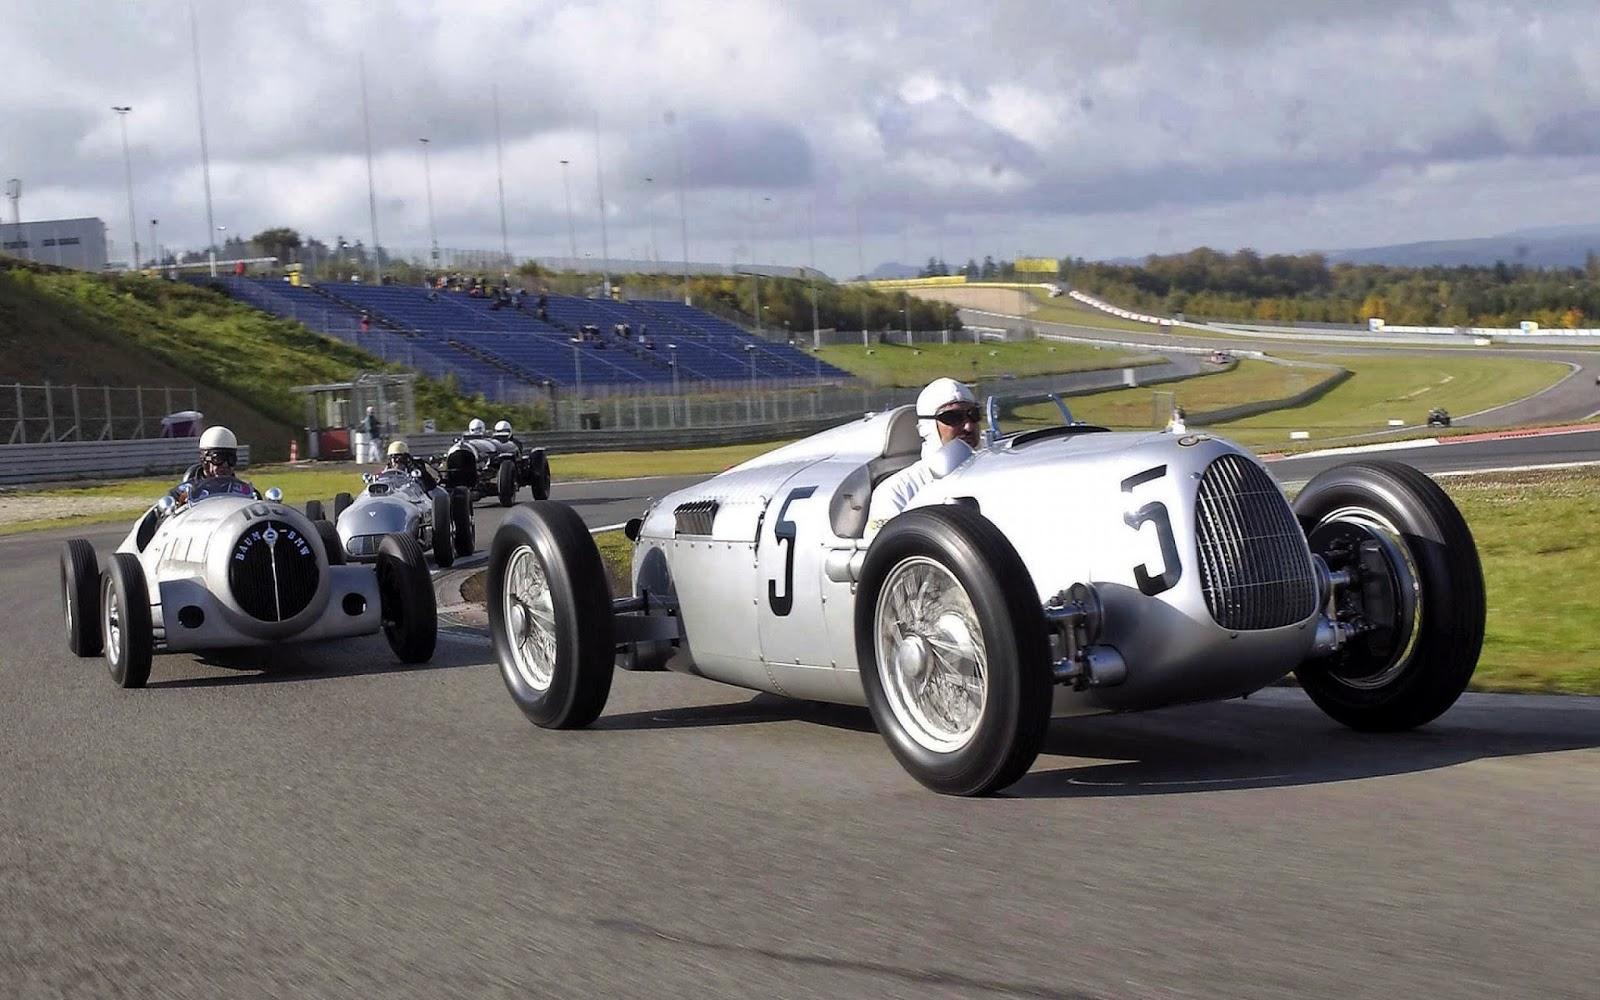 Transpress Nz 1930s Auto Union Racing Cars Germany